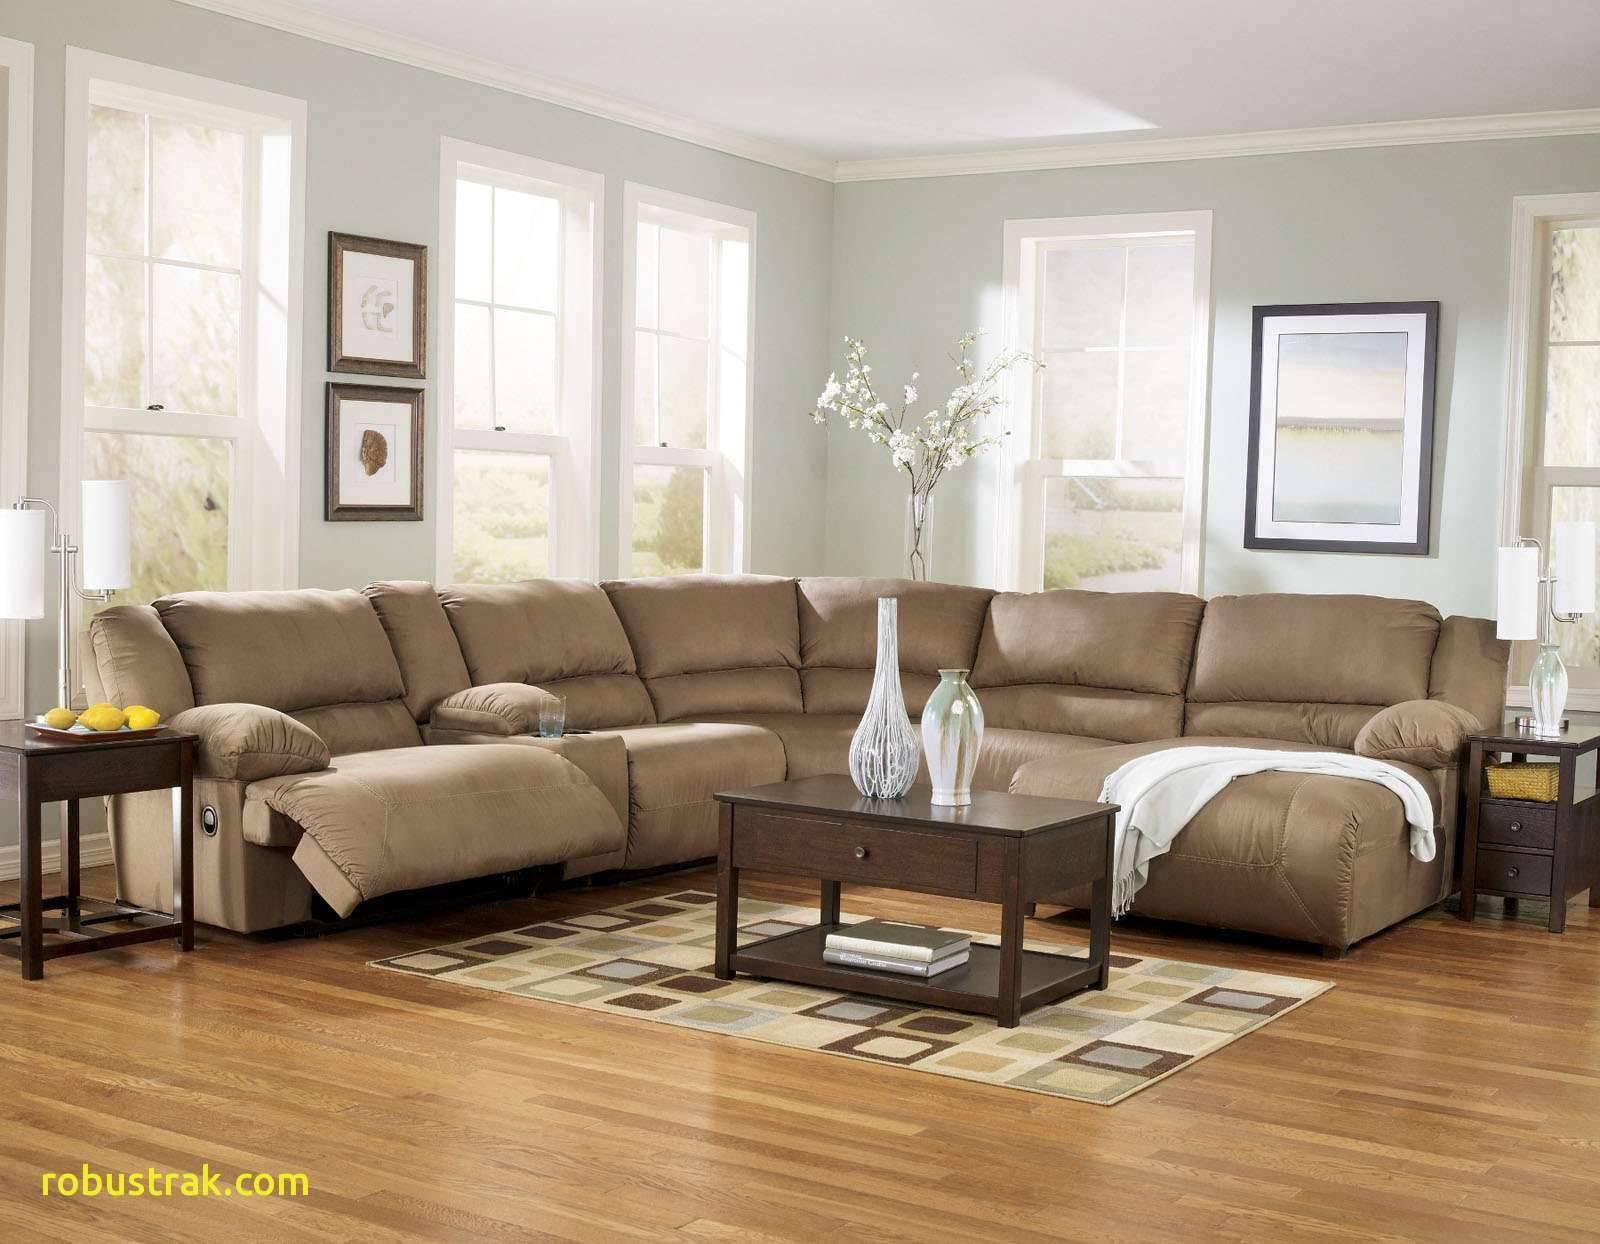 light hardwood floor living room ideas of unique light brown sofa wall color home design ideas in living room 4way living room sectional sofa and sofas ideas home interior plus awe inspiring